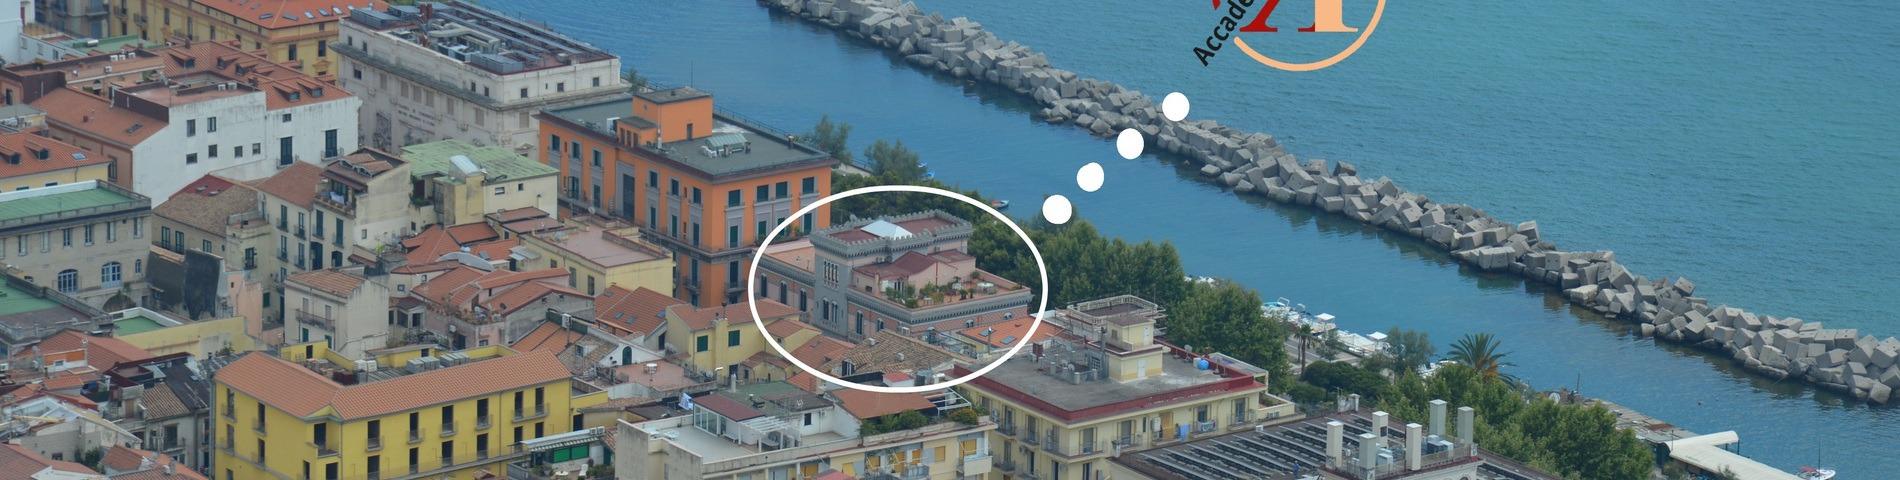 accademia italiana salerno reviews of movies - photo#29